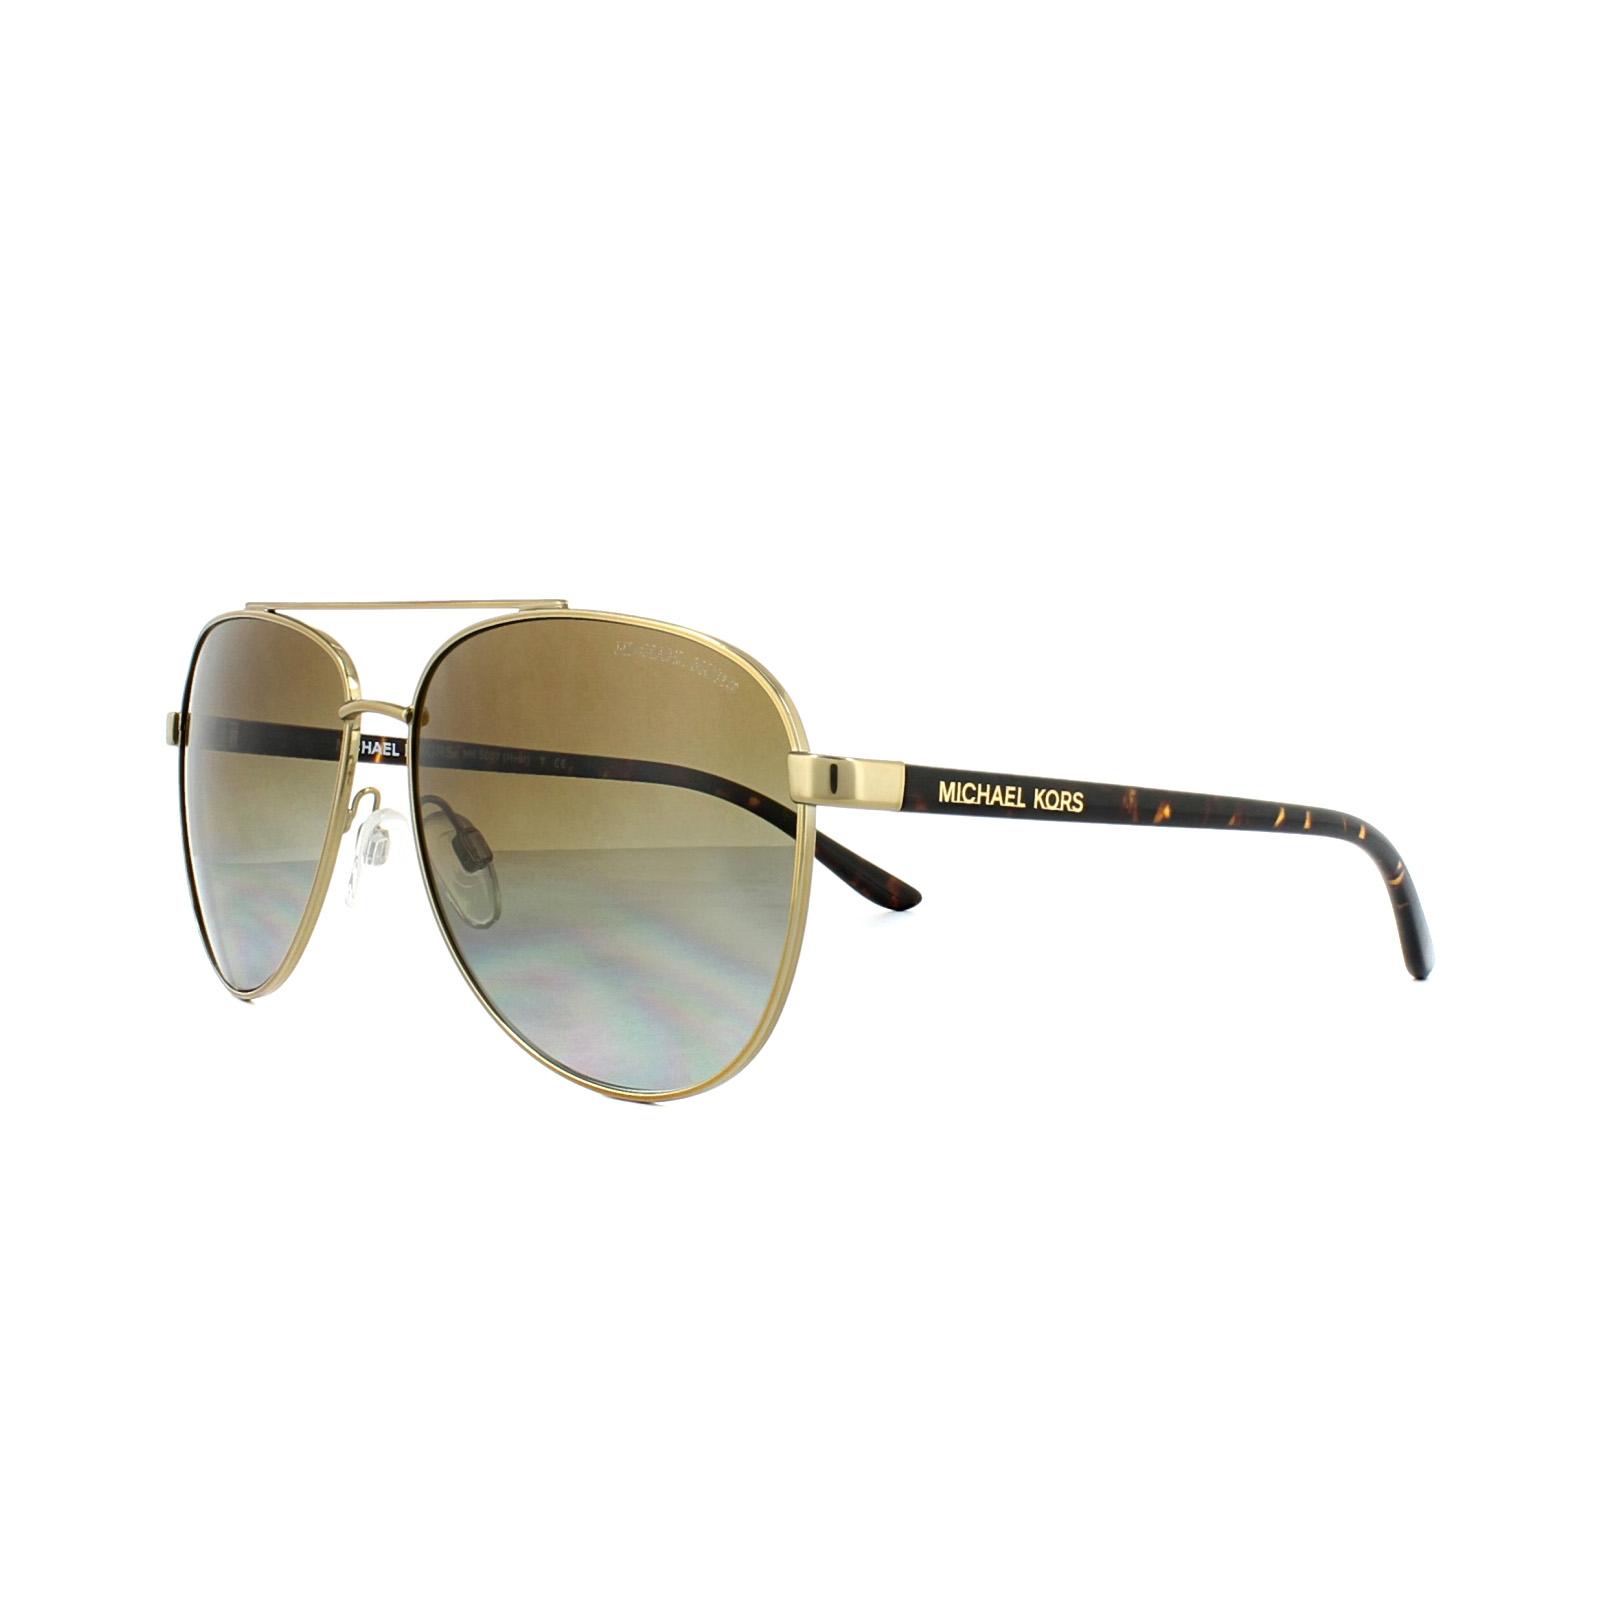 Sentinel Michael Kors Sunglasses Hvar 5007 1044 T5 Gold Havana Brown  Gradient Polarized 07653501e0